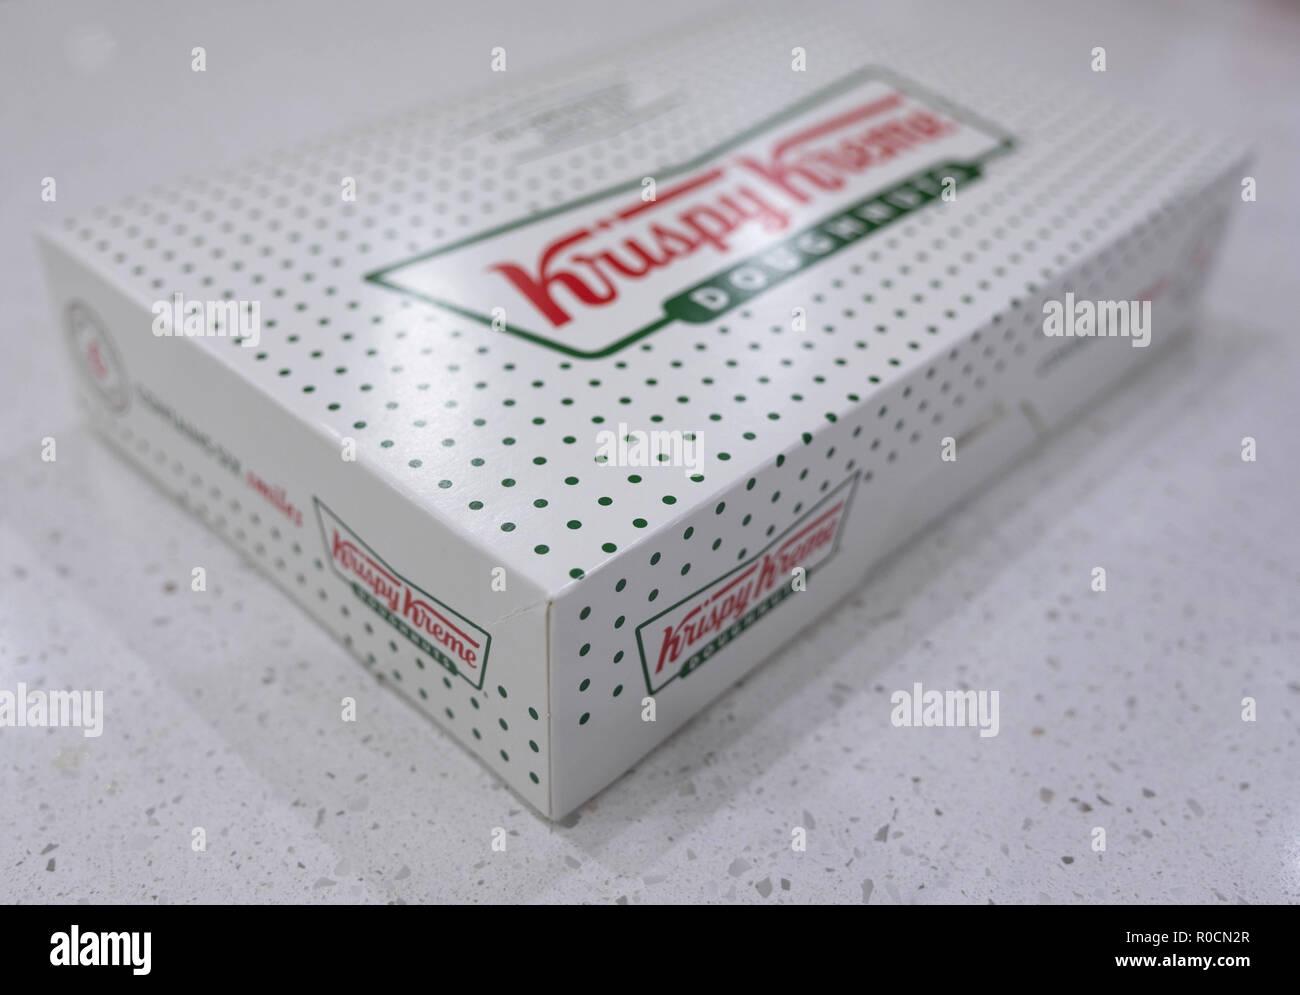 krispy kreme doughnuts in